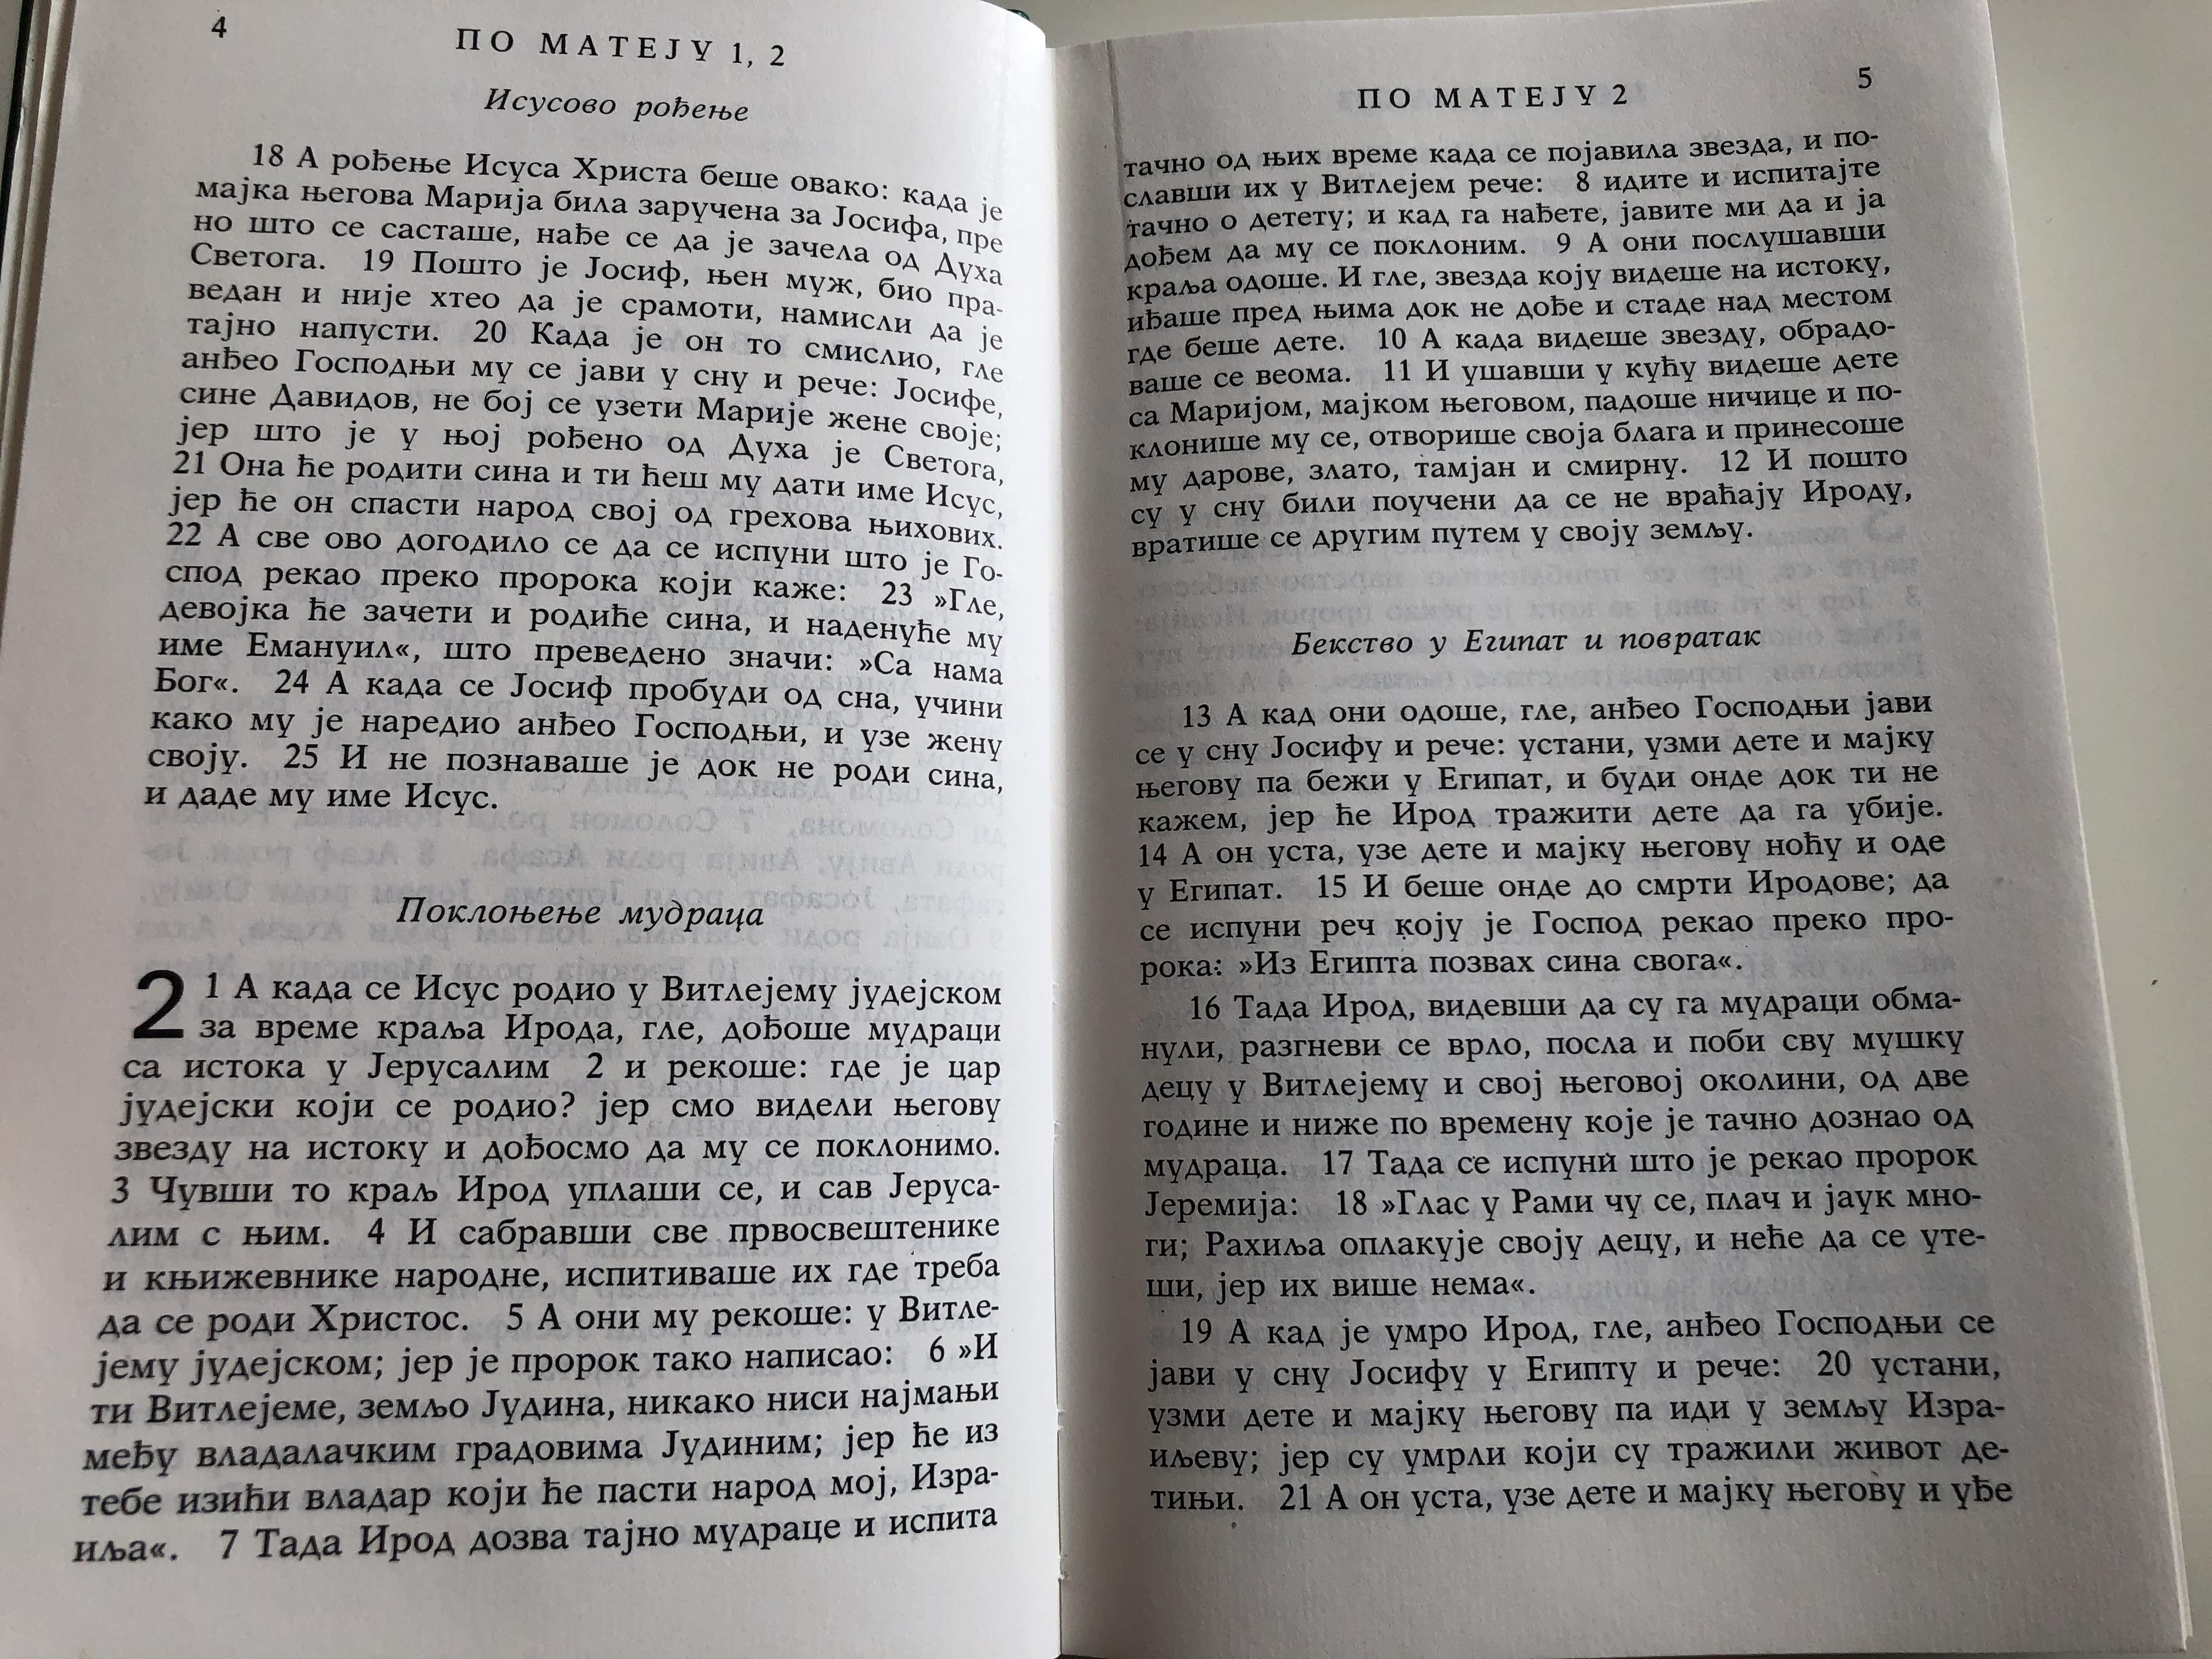 serbian-new-testament-novi-zavet-emilijan-m.-arni-10.jpg